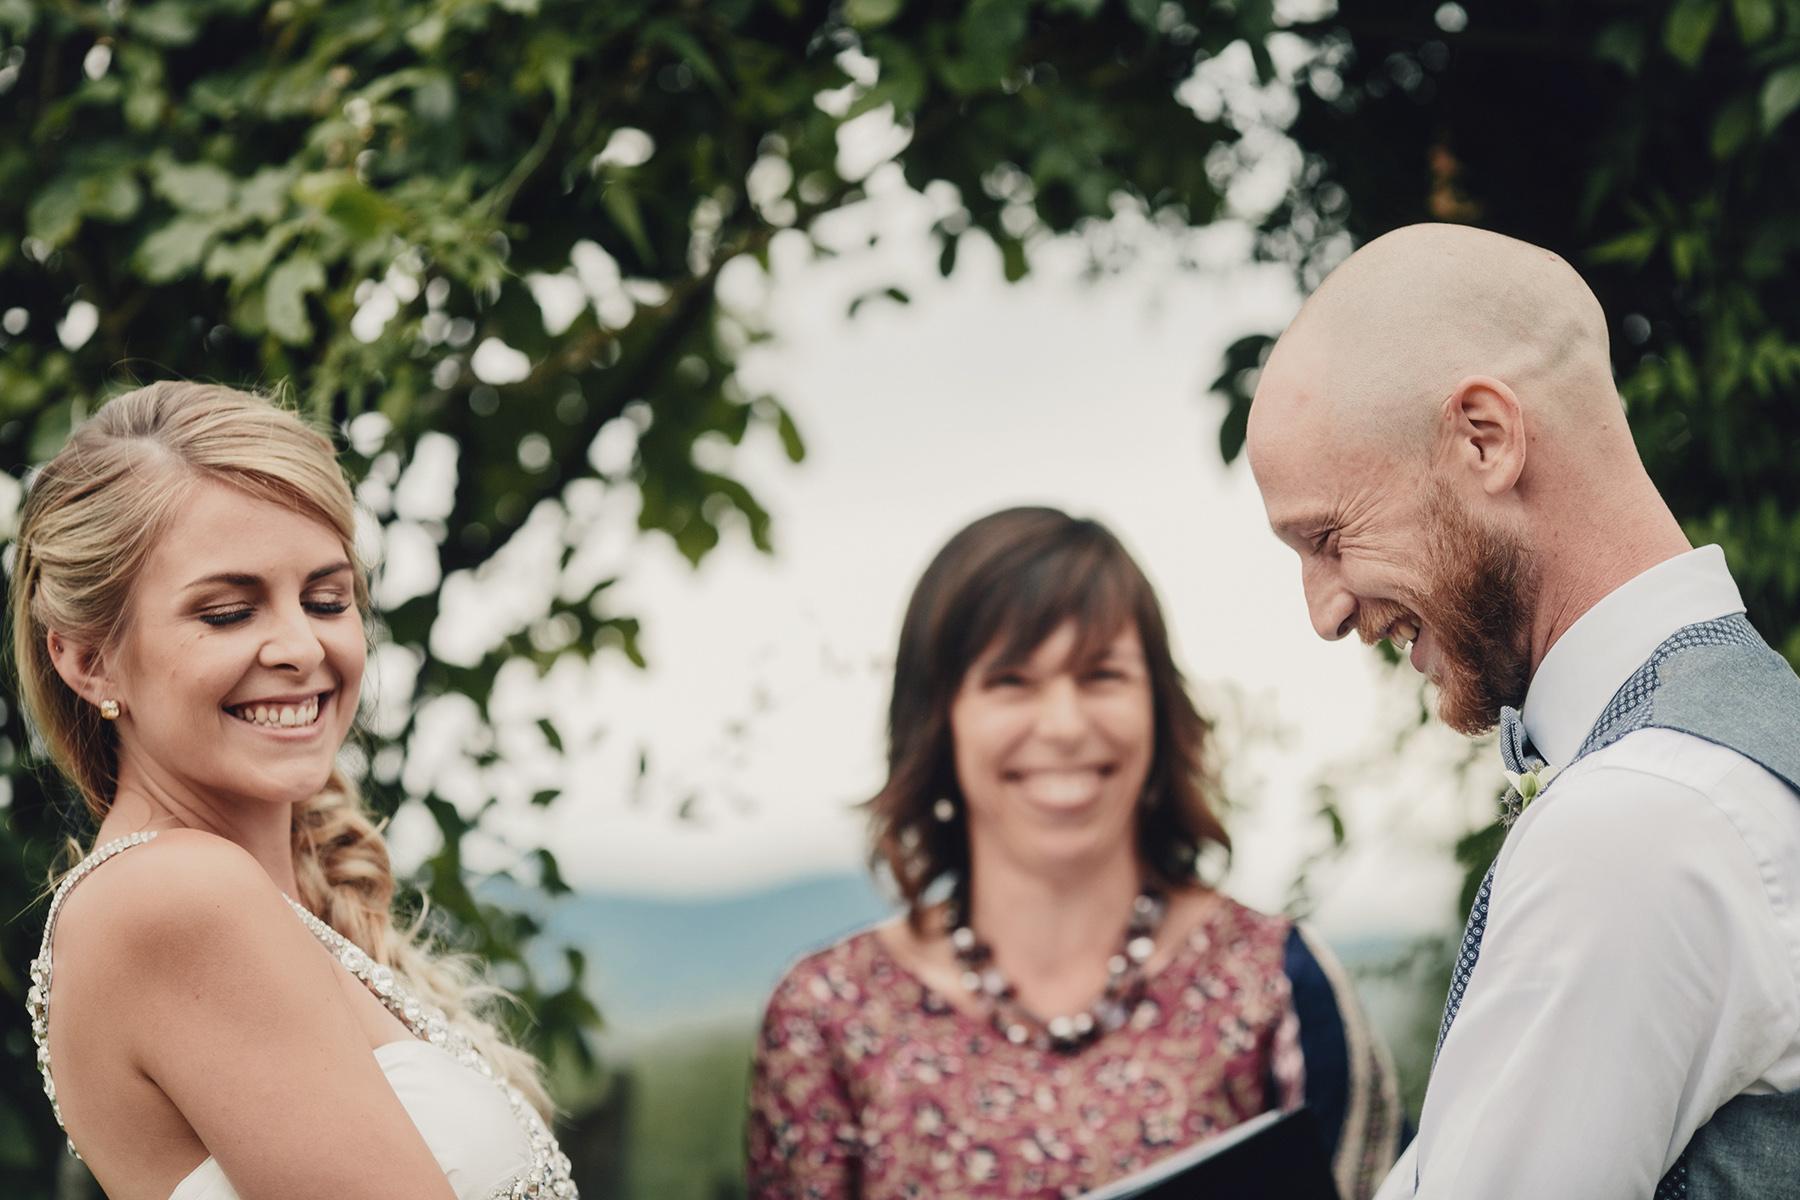 kildara-farms-wedding-photo-inspiration-0038